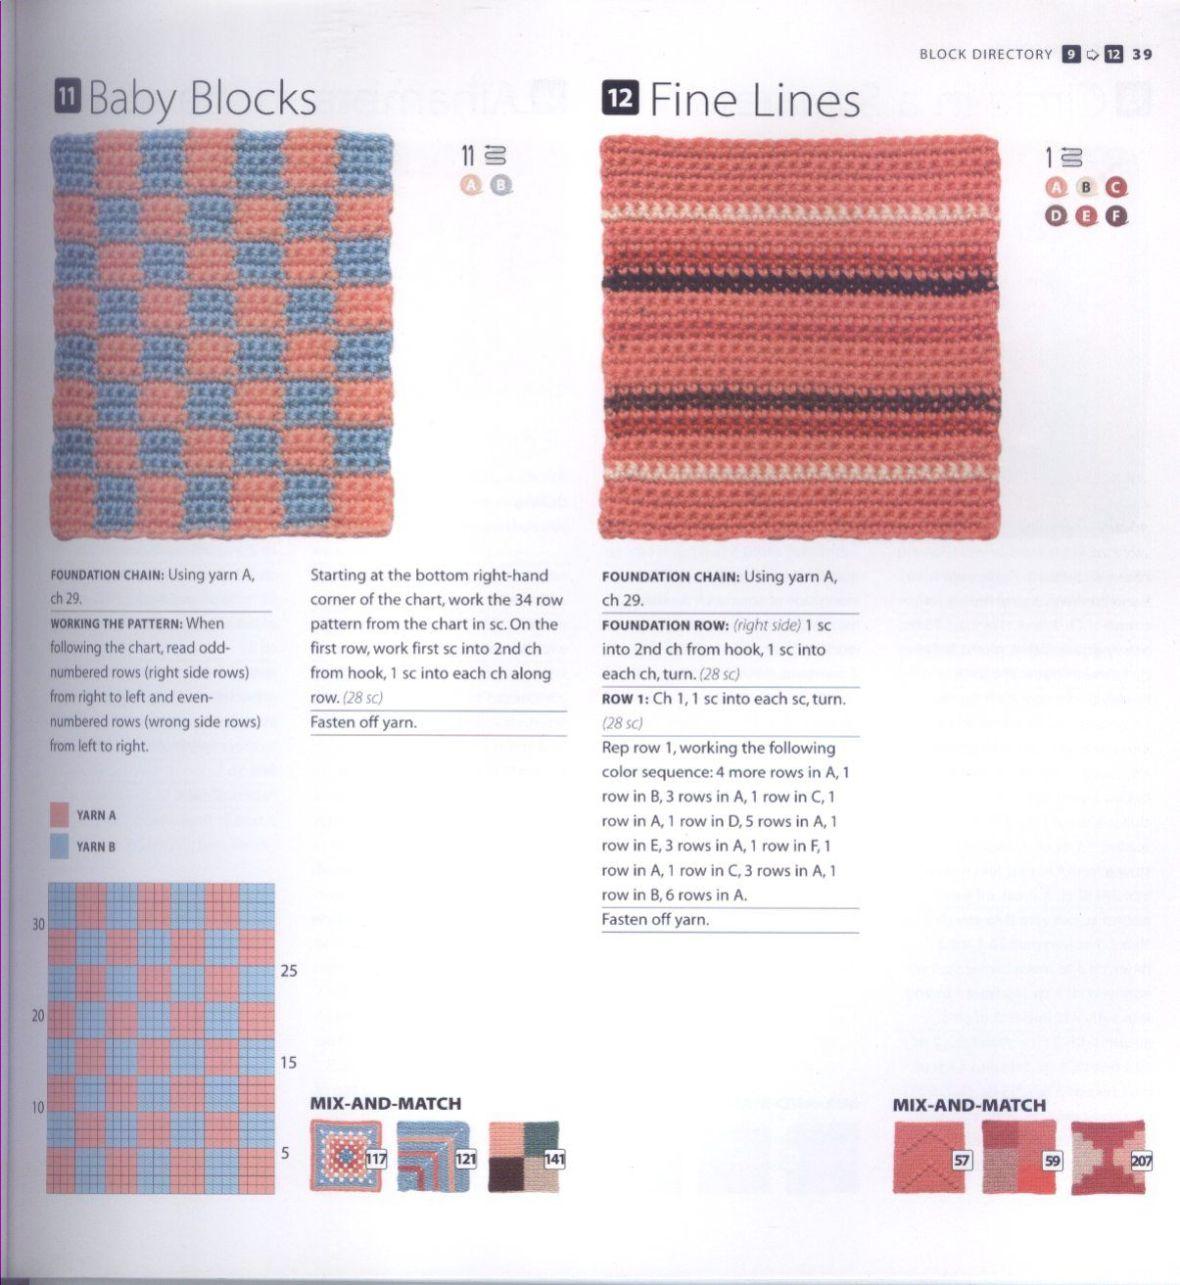 200 Crocheted Blocks for blankets, throws & Afghans 039